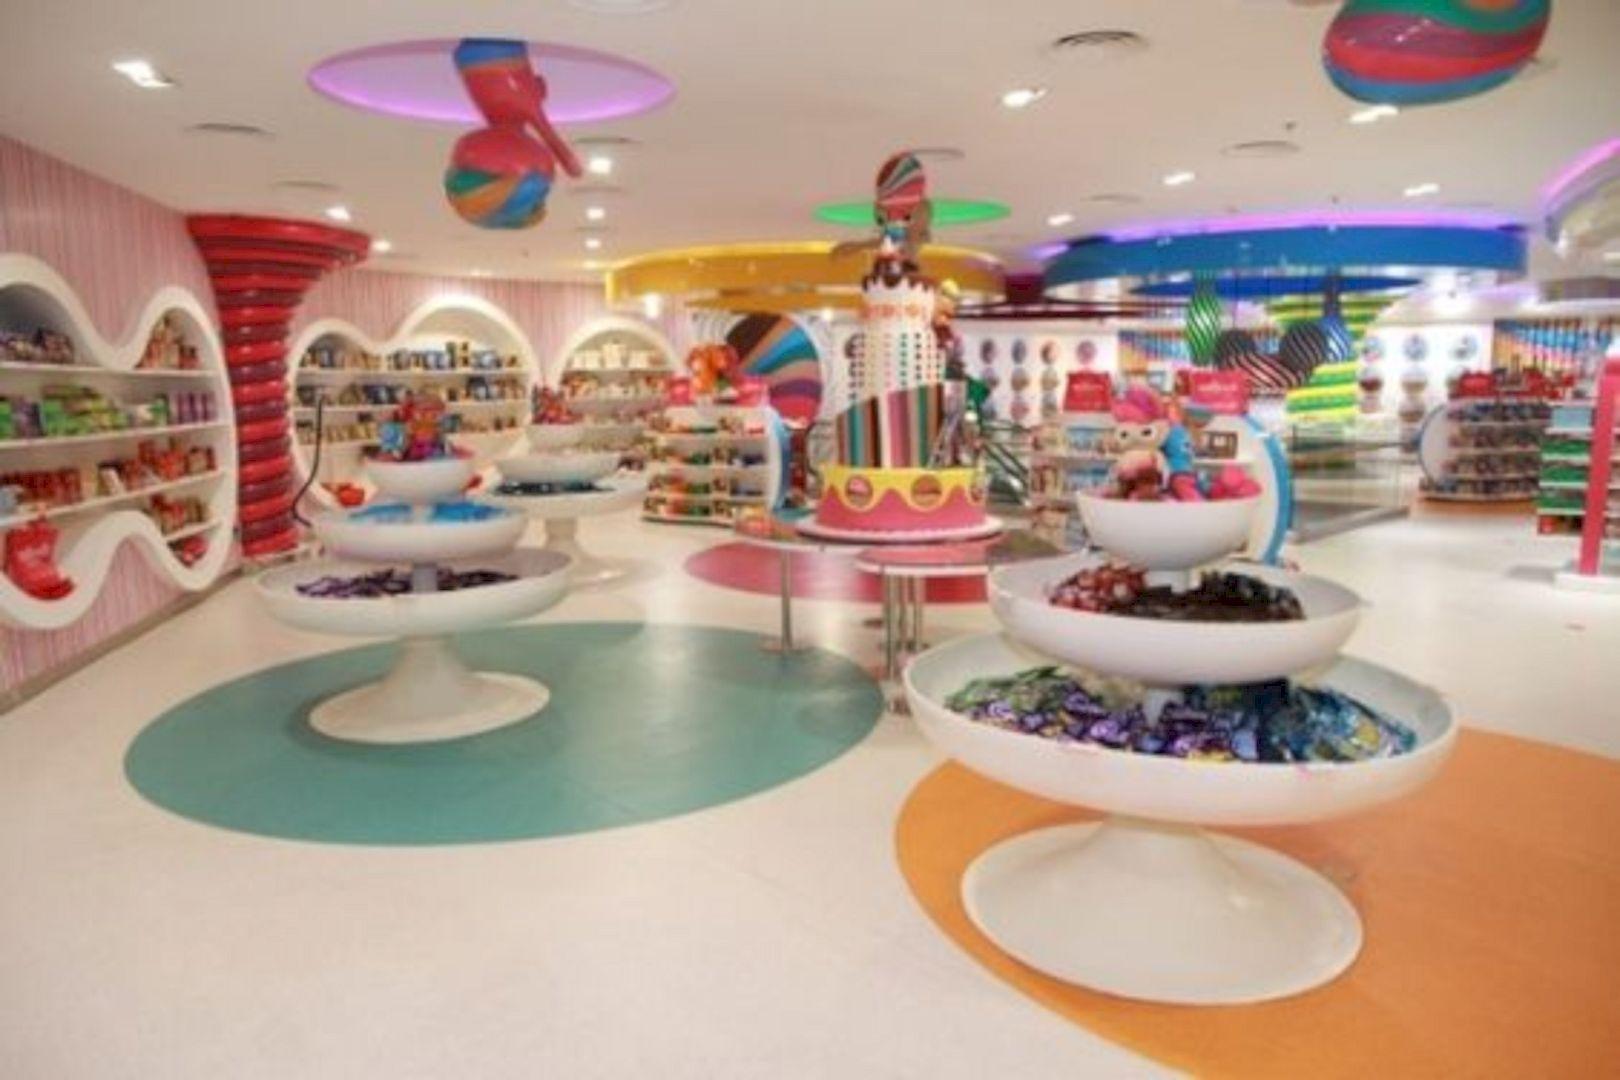 15 Shop Display Interior Design Ideas to Attract More